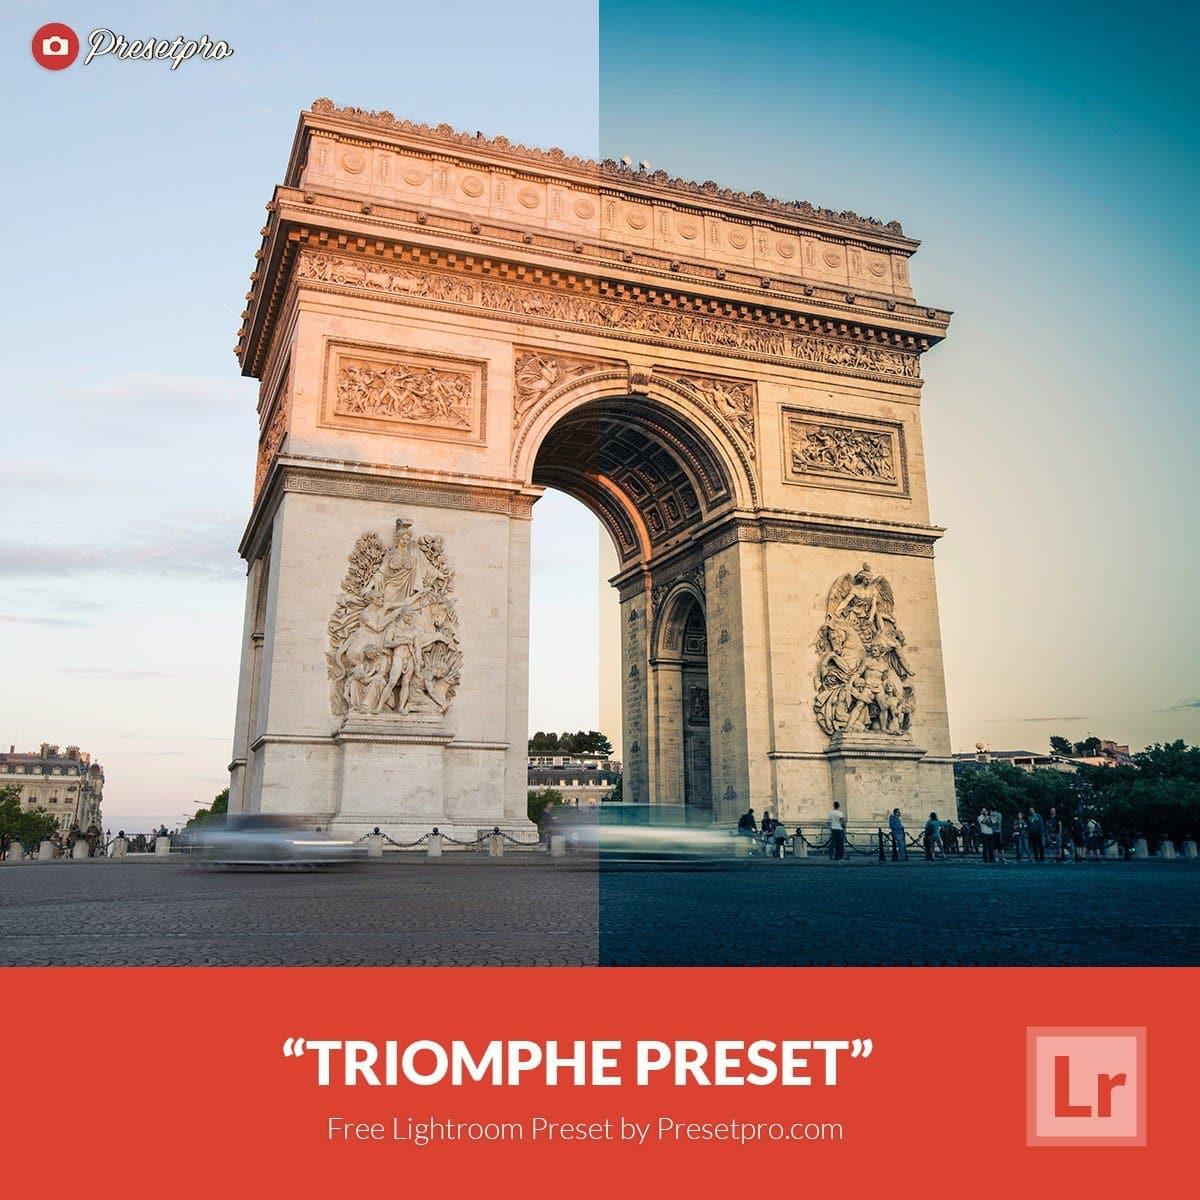 Free-Lightroom-Preset-Triomphe-Presetpro.com